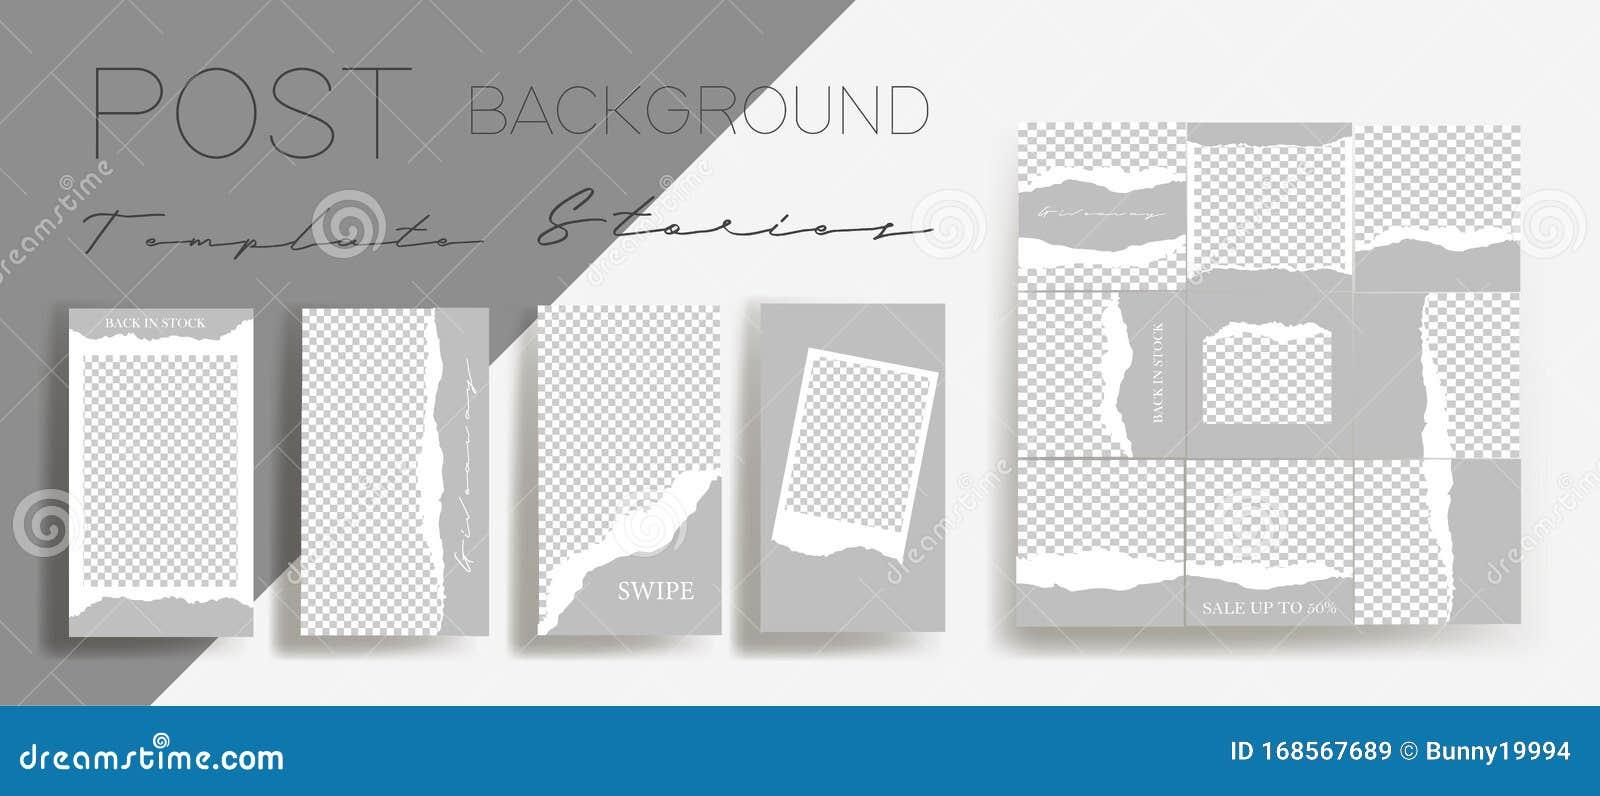 Design Backgrounds For Social Media Banner Set Of Instagram Stories And Post Frame Templates Stock Vector Illustration Of Application Bundle 168567689